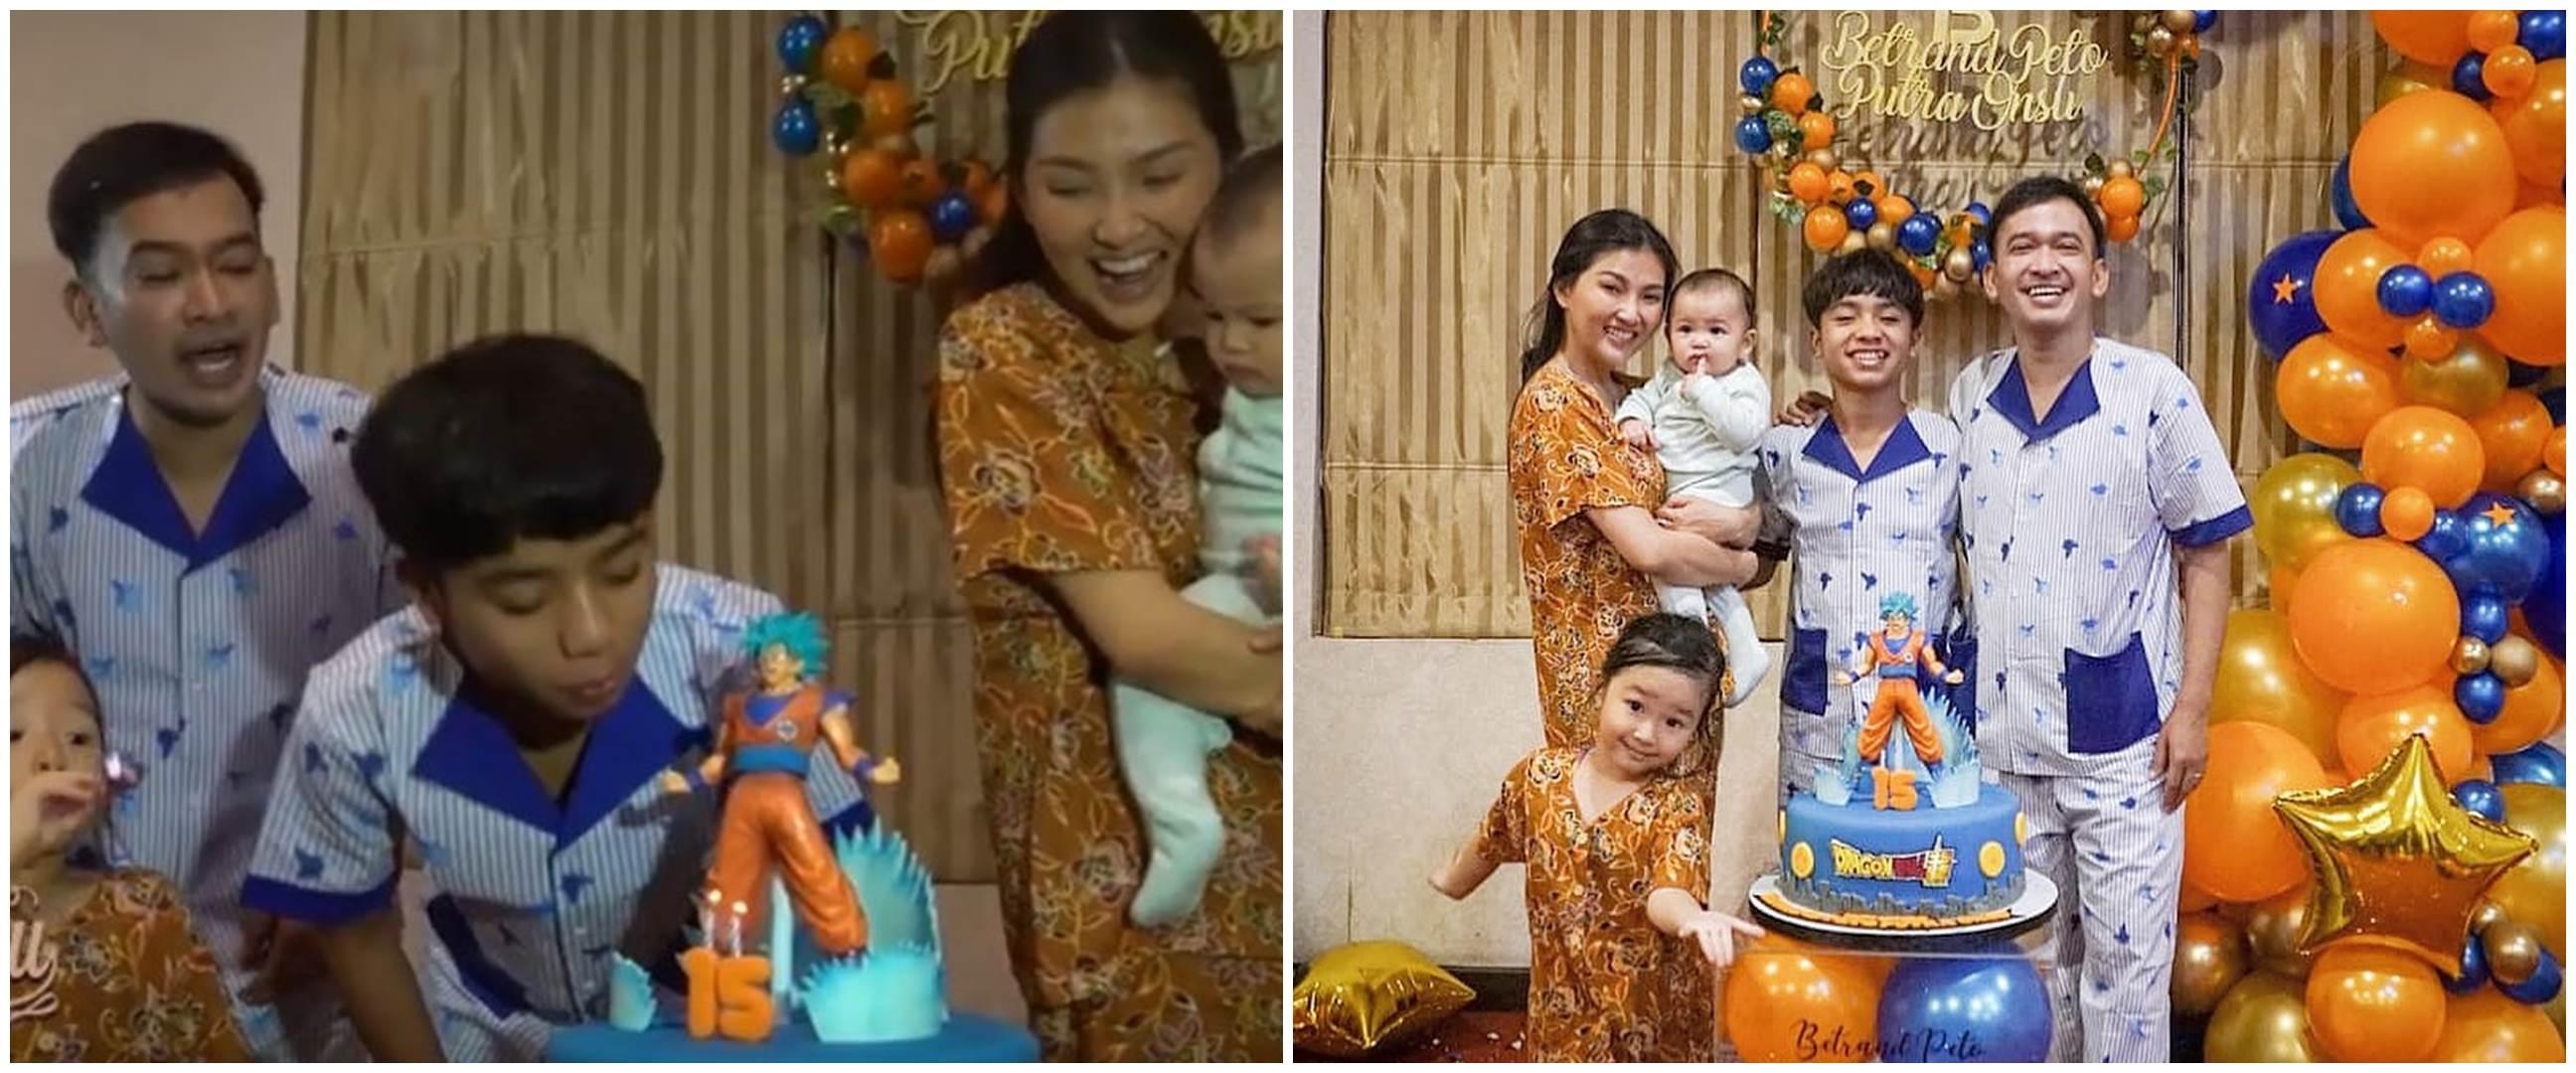 8 Momen kemeriahan ulang tahun Betrand Peto, bertema Dragon Ball